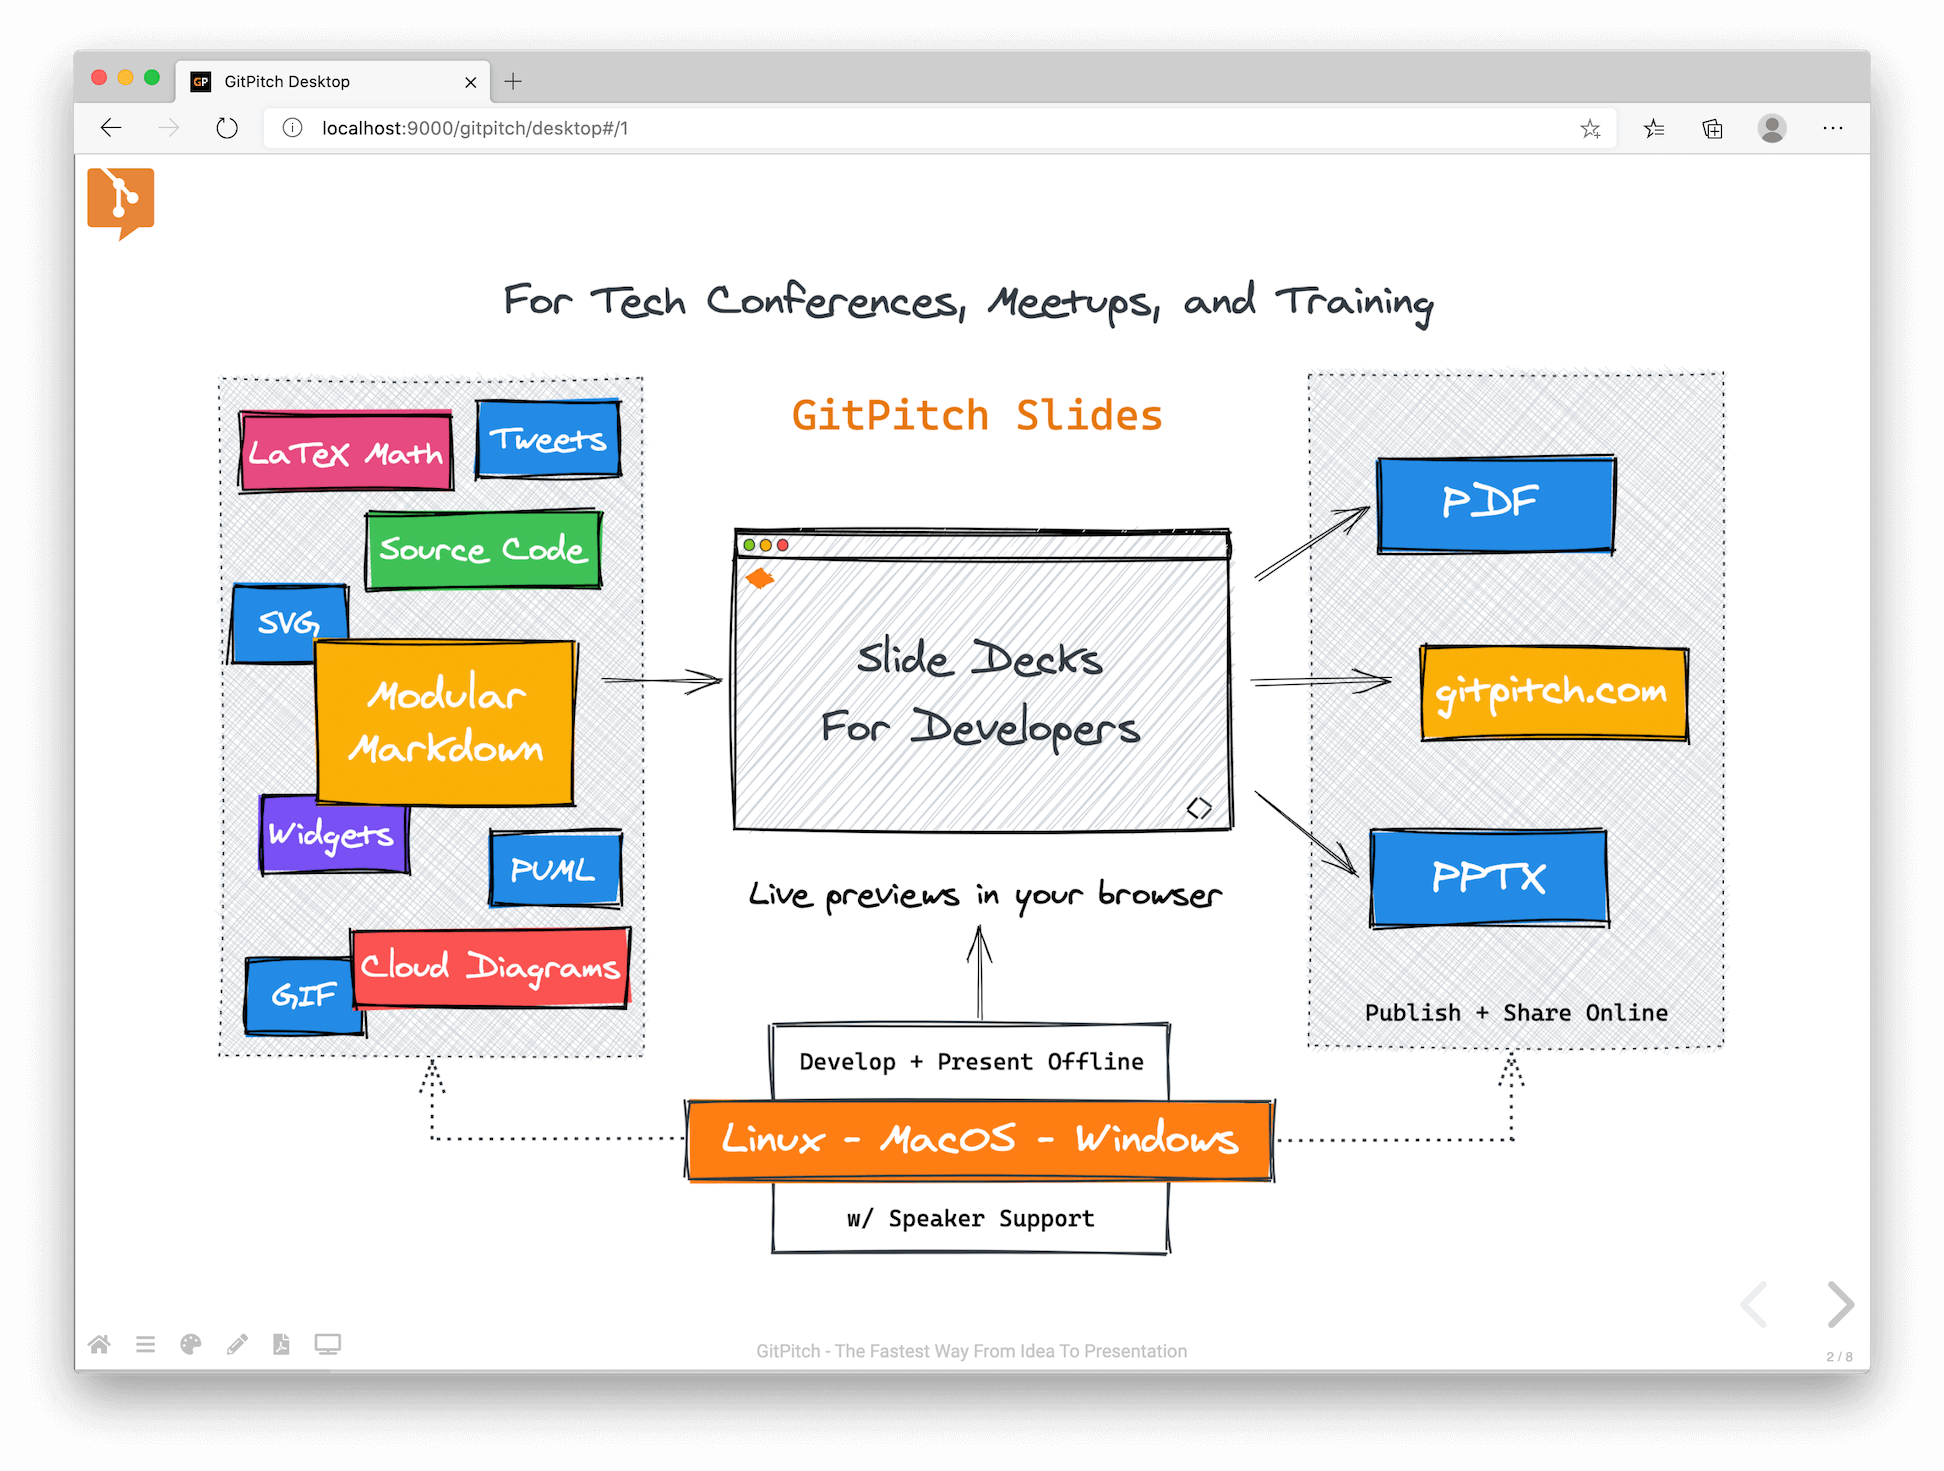 assets/changelog/gitpitch-desktop-whiteboard.png